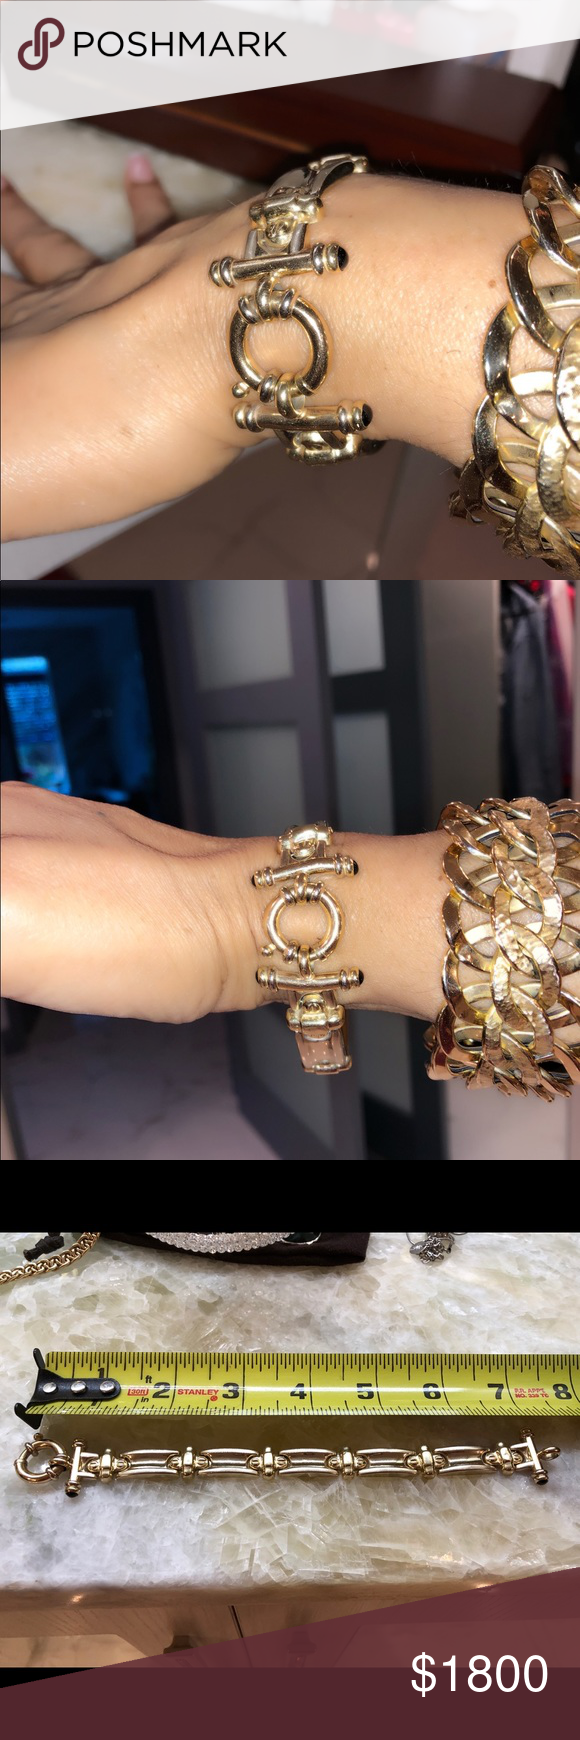 kt italian gold bracelet w sapphire cabochons my posh closet